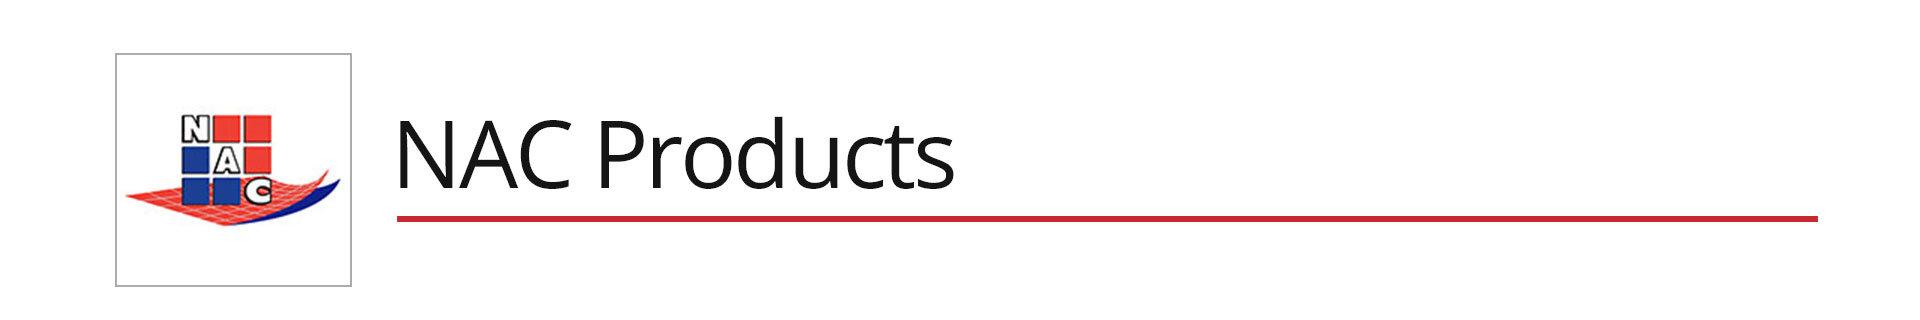 NACProducts_CADBlock-Header.jpg